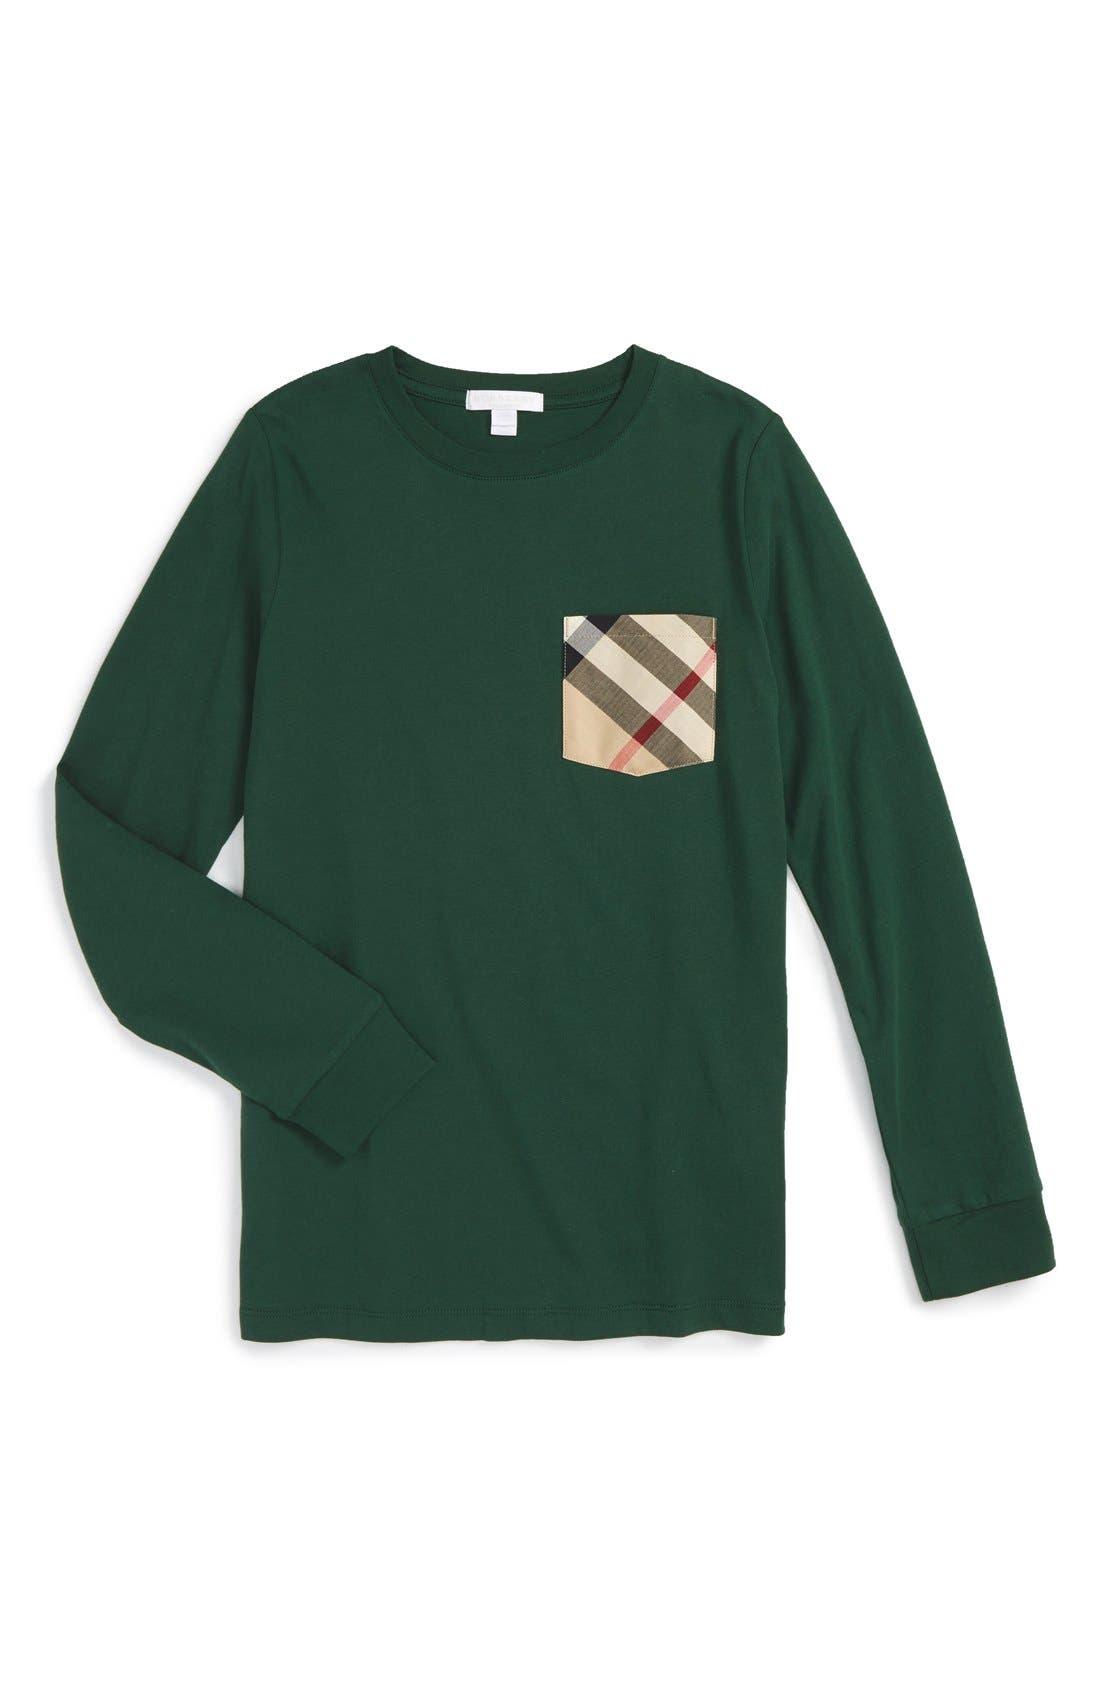 Main Image - Burberry Check Pocket T-Shirt (Little Boys & Big Boys)